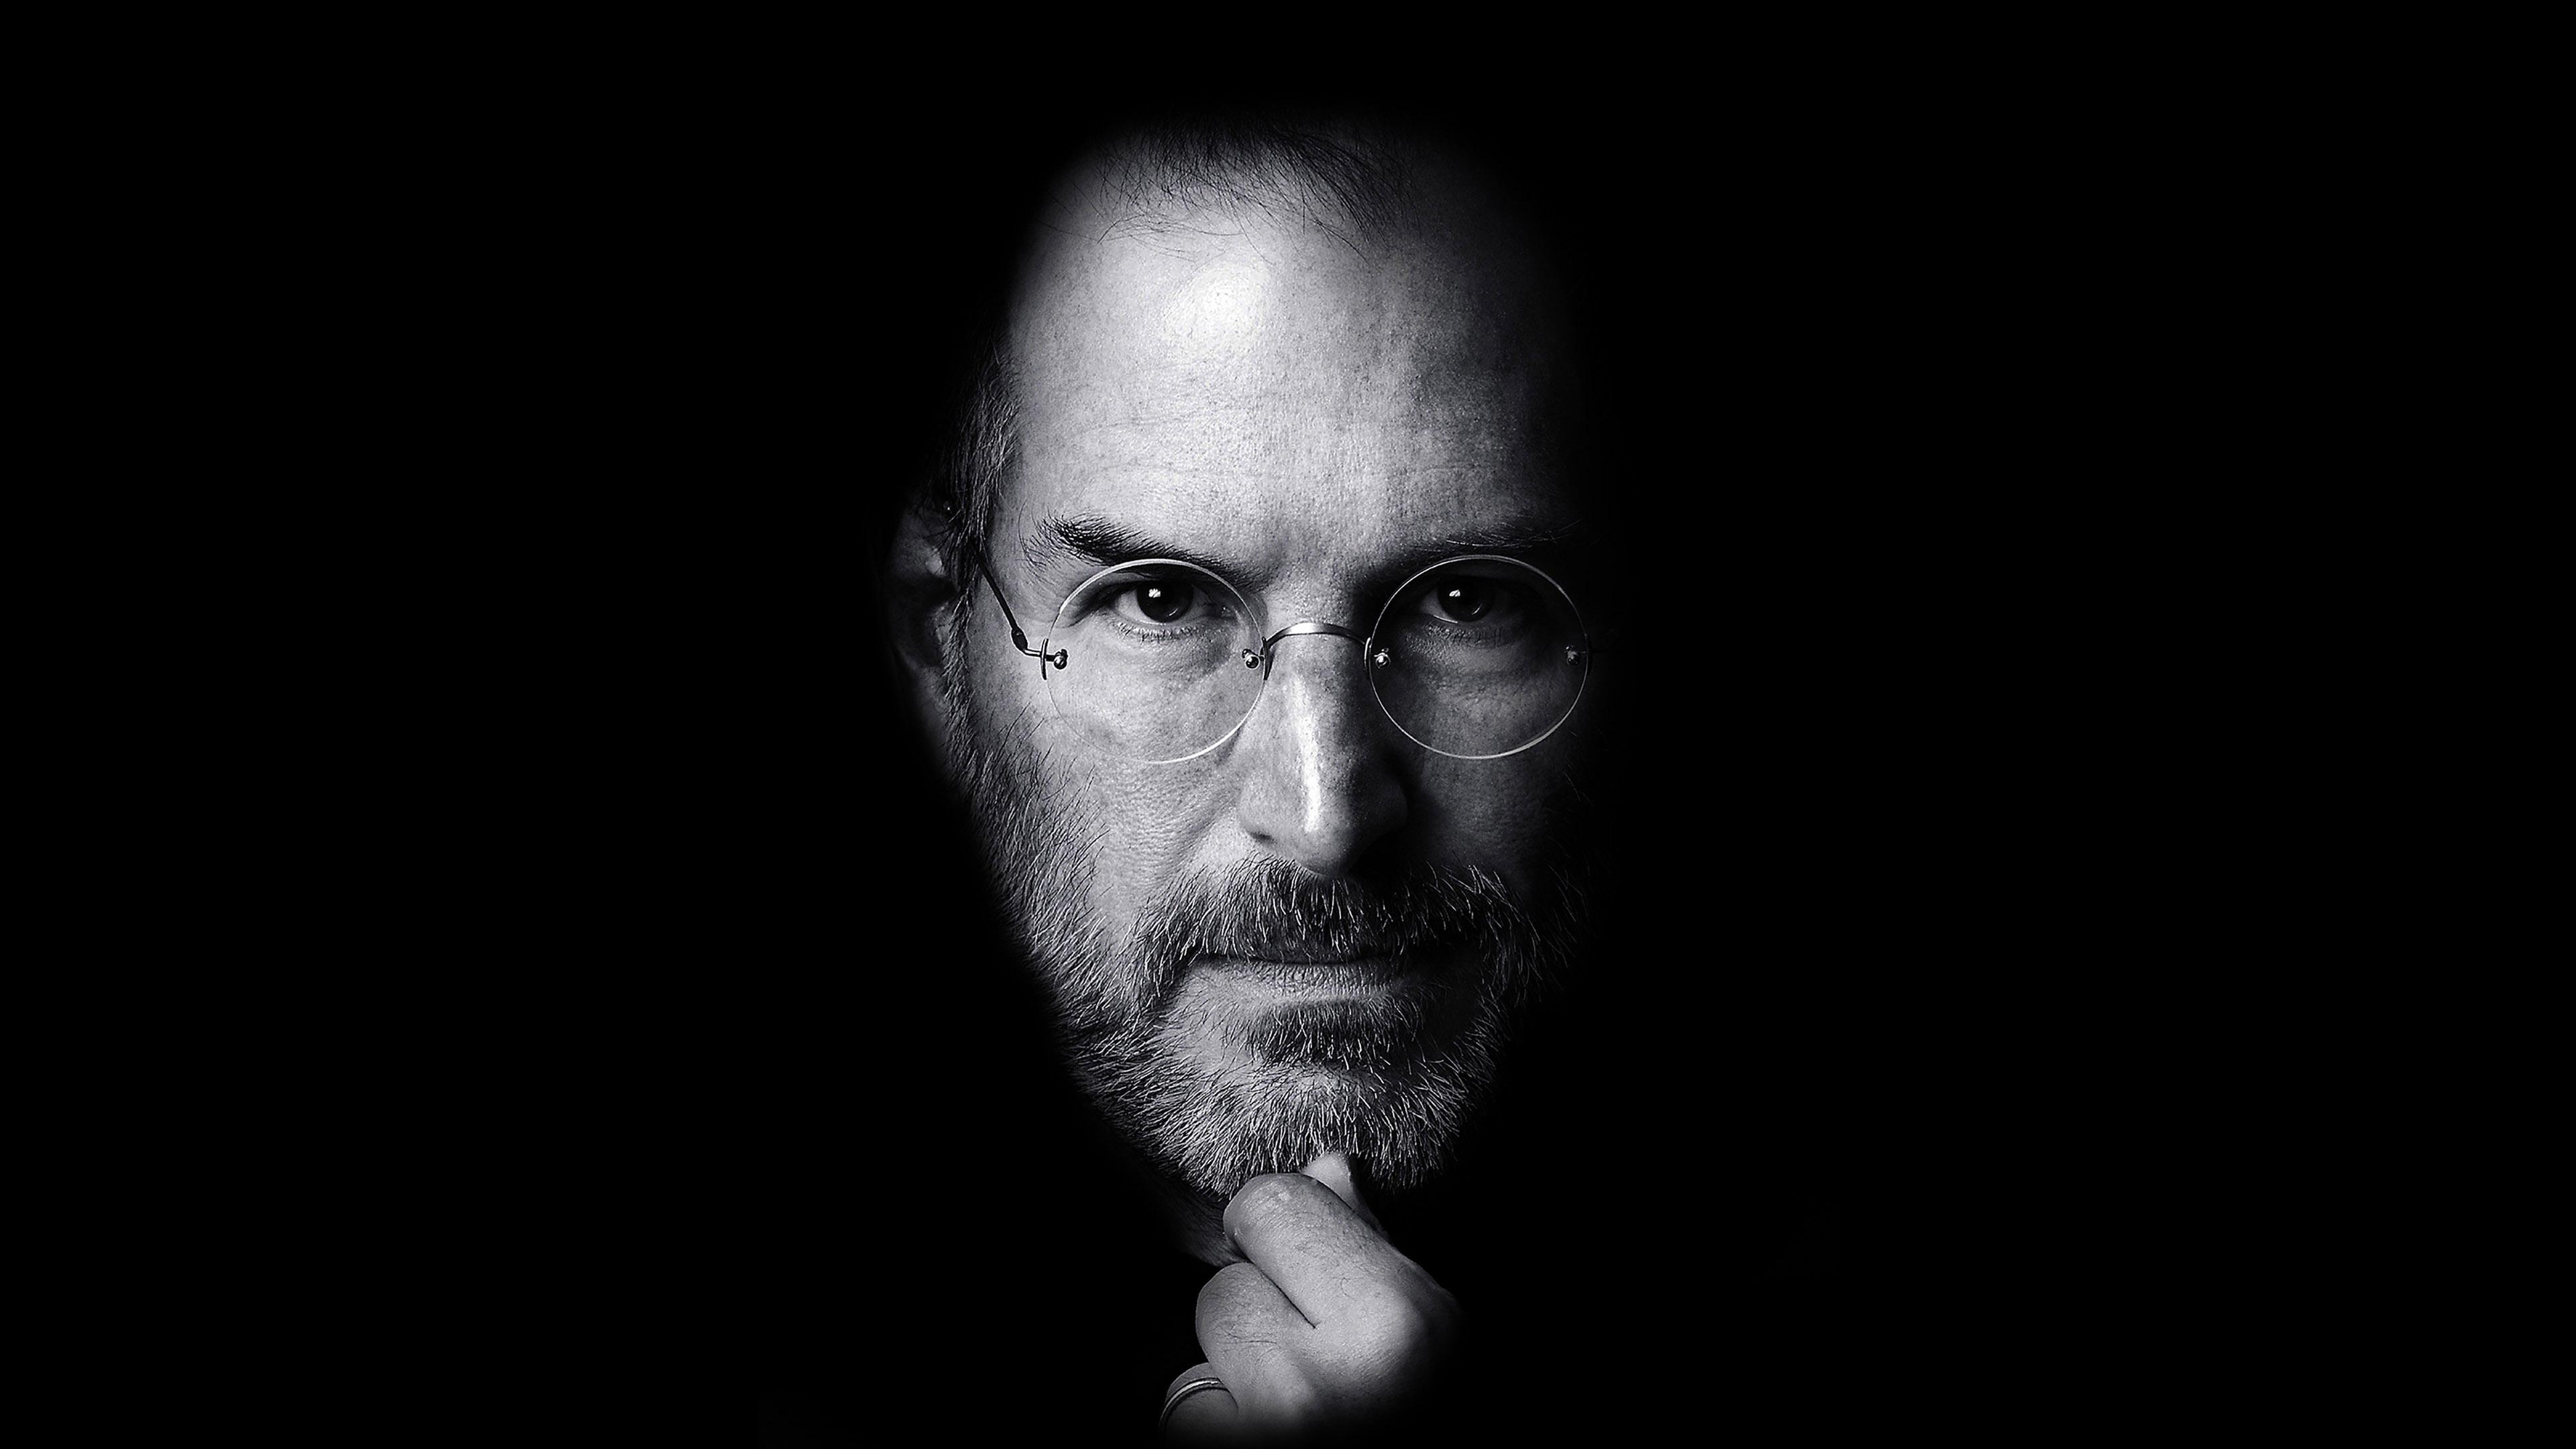 Fall Wallpaper For Macbook Pro Ha87 Wallpaper Steve Jobs Face Apple Papers Co